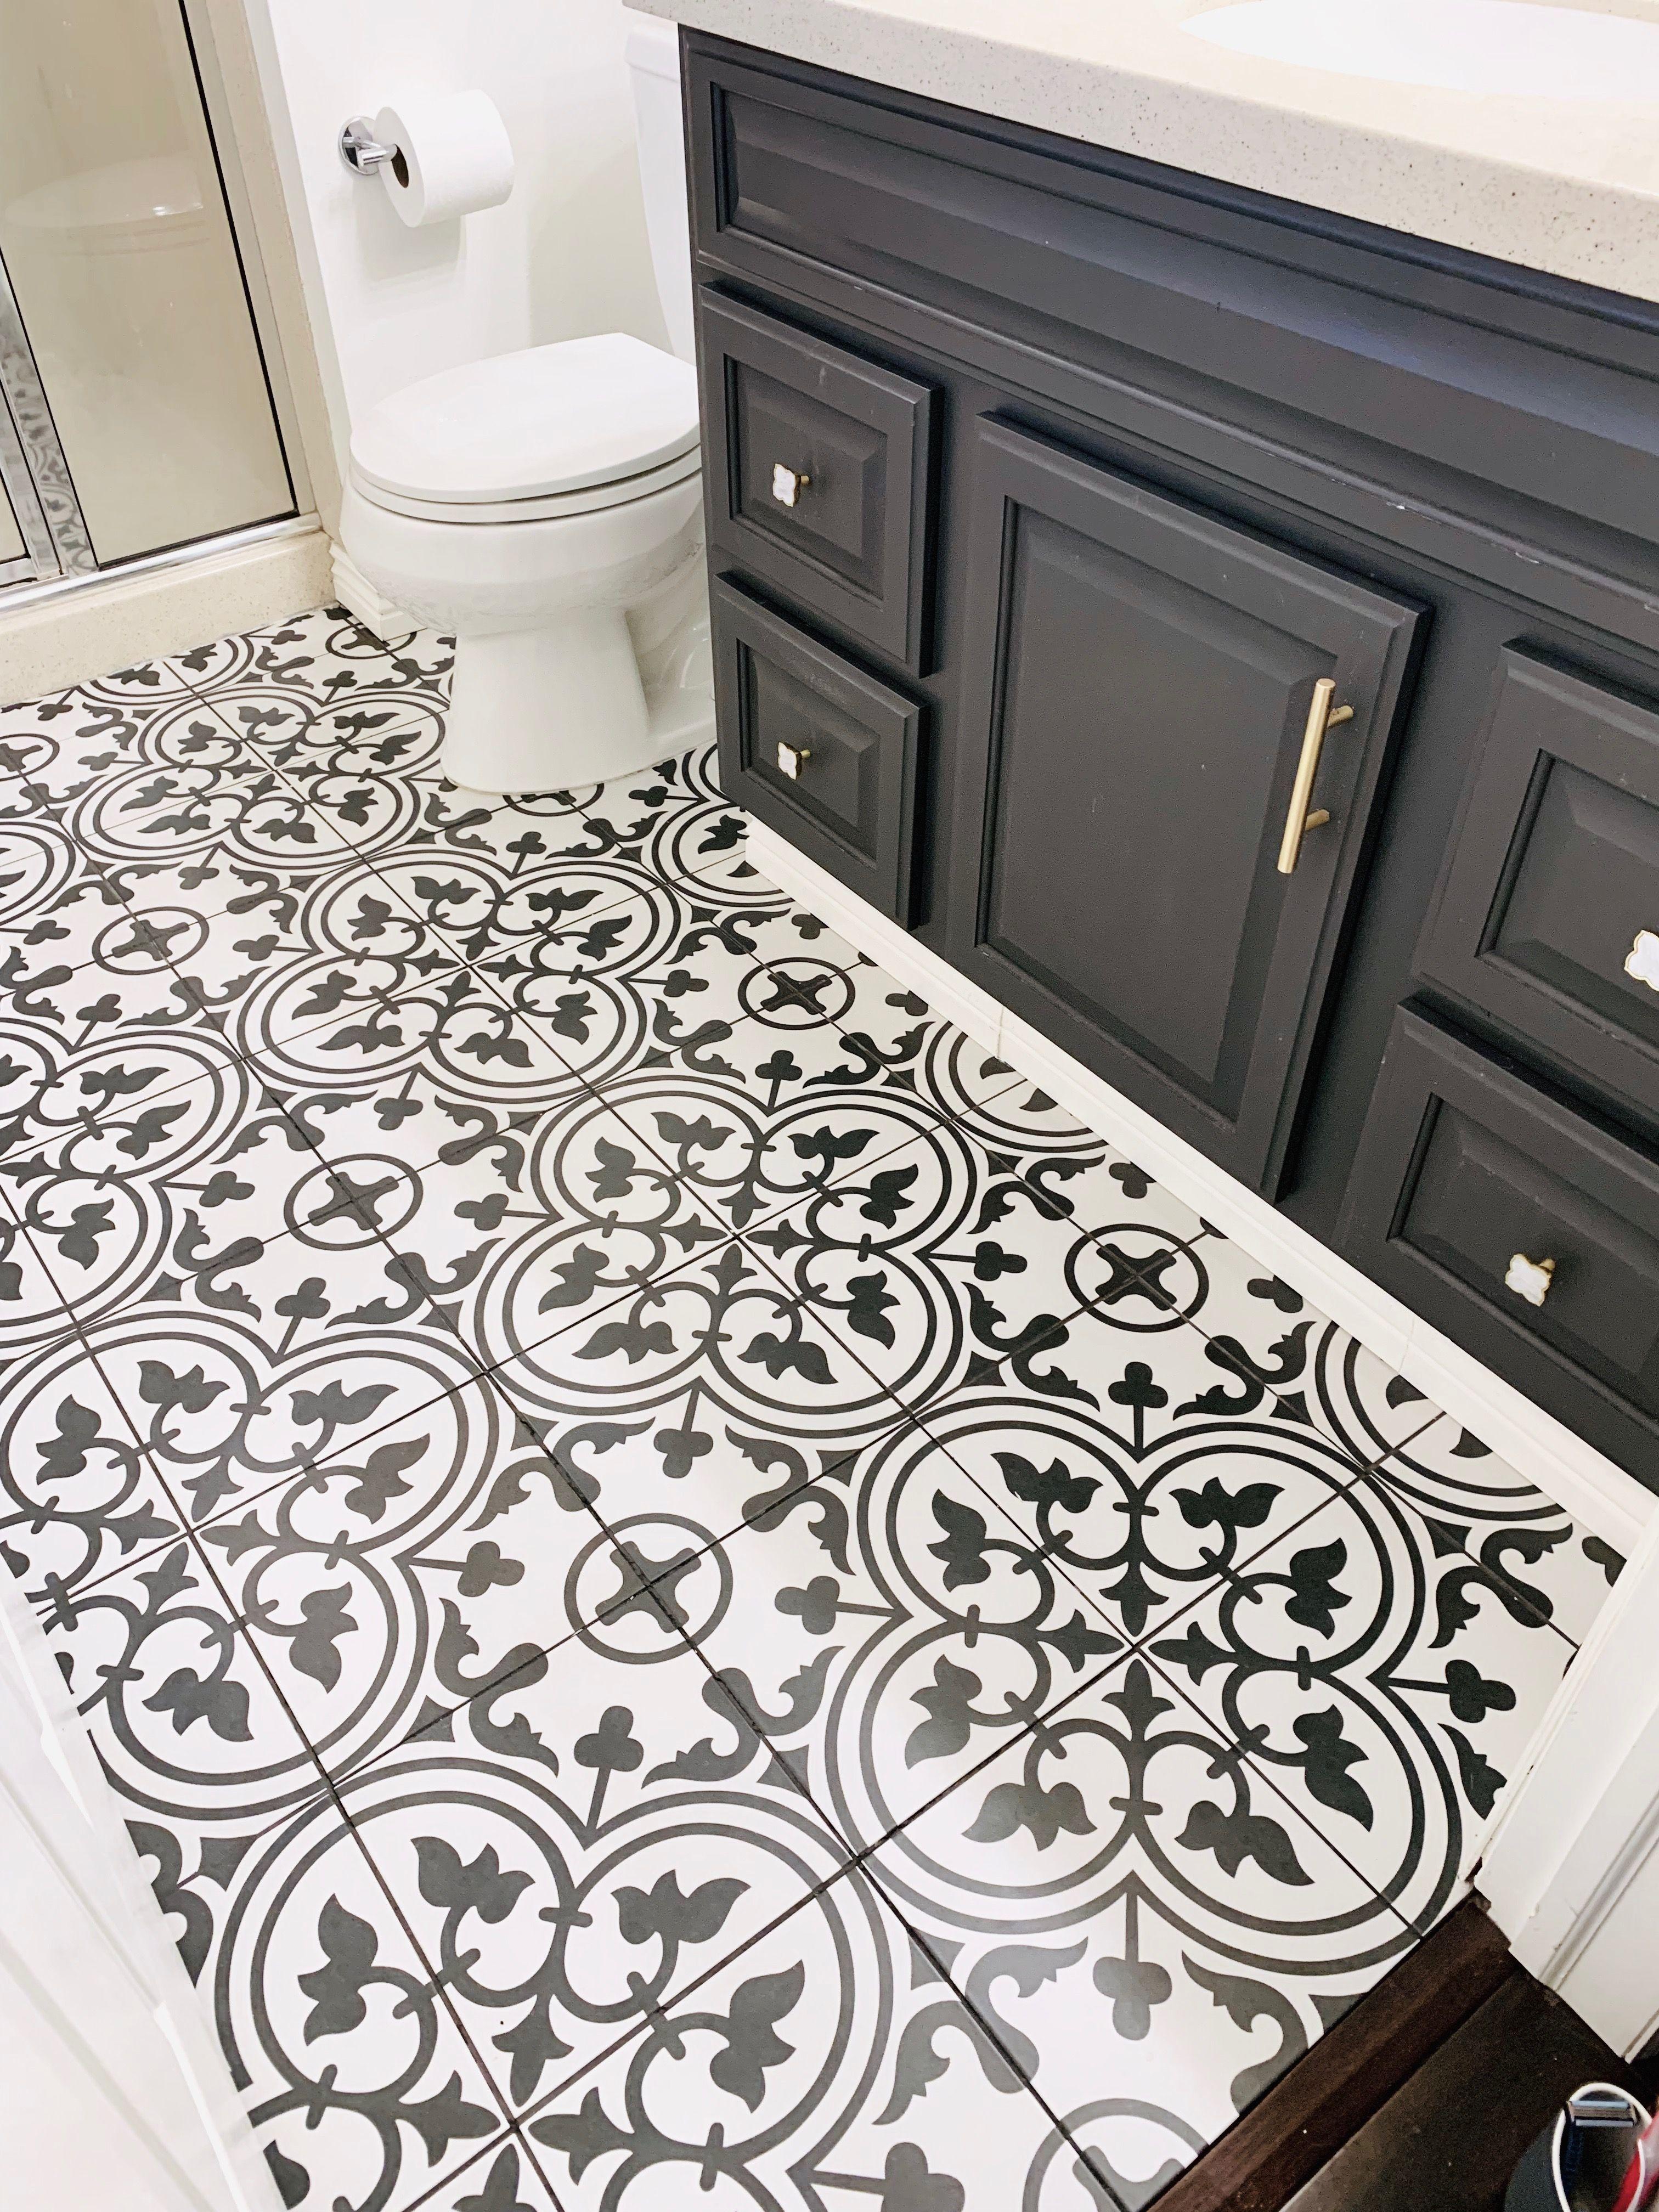 Bathroom Tile Renovation Bathroom Tile Renovation Bathroom Interior Design White Bathroom Tiles